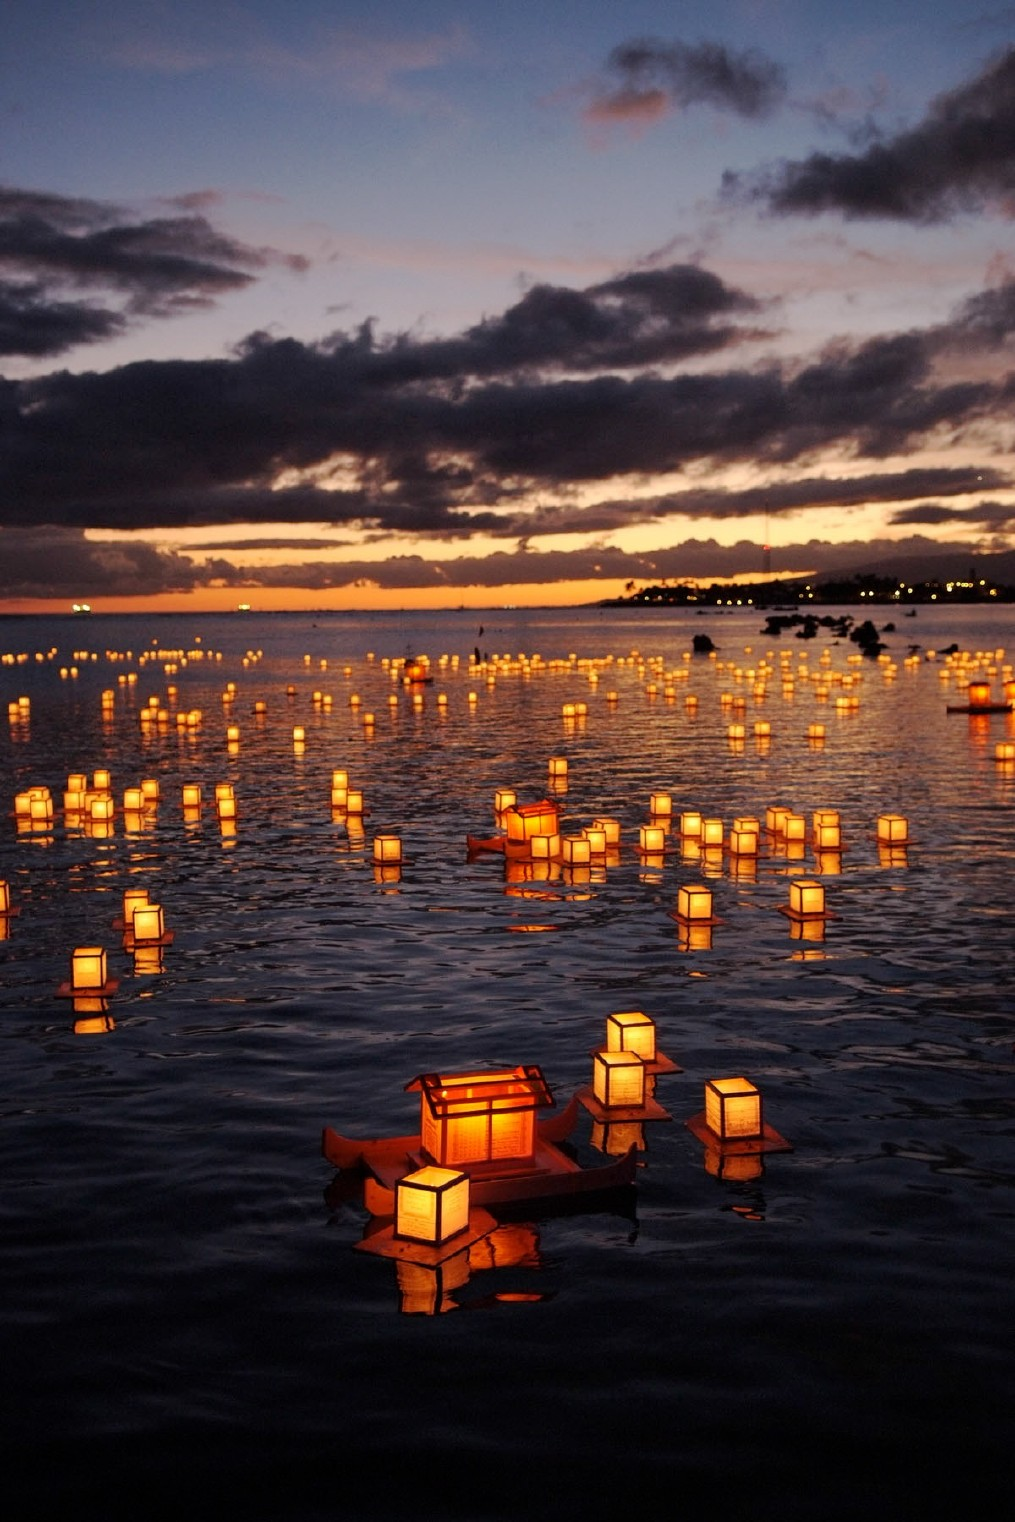 Travel Trip Journey : Floating Lanterns, Honolulu, Hawaii